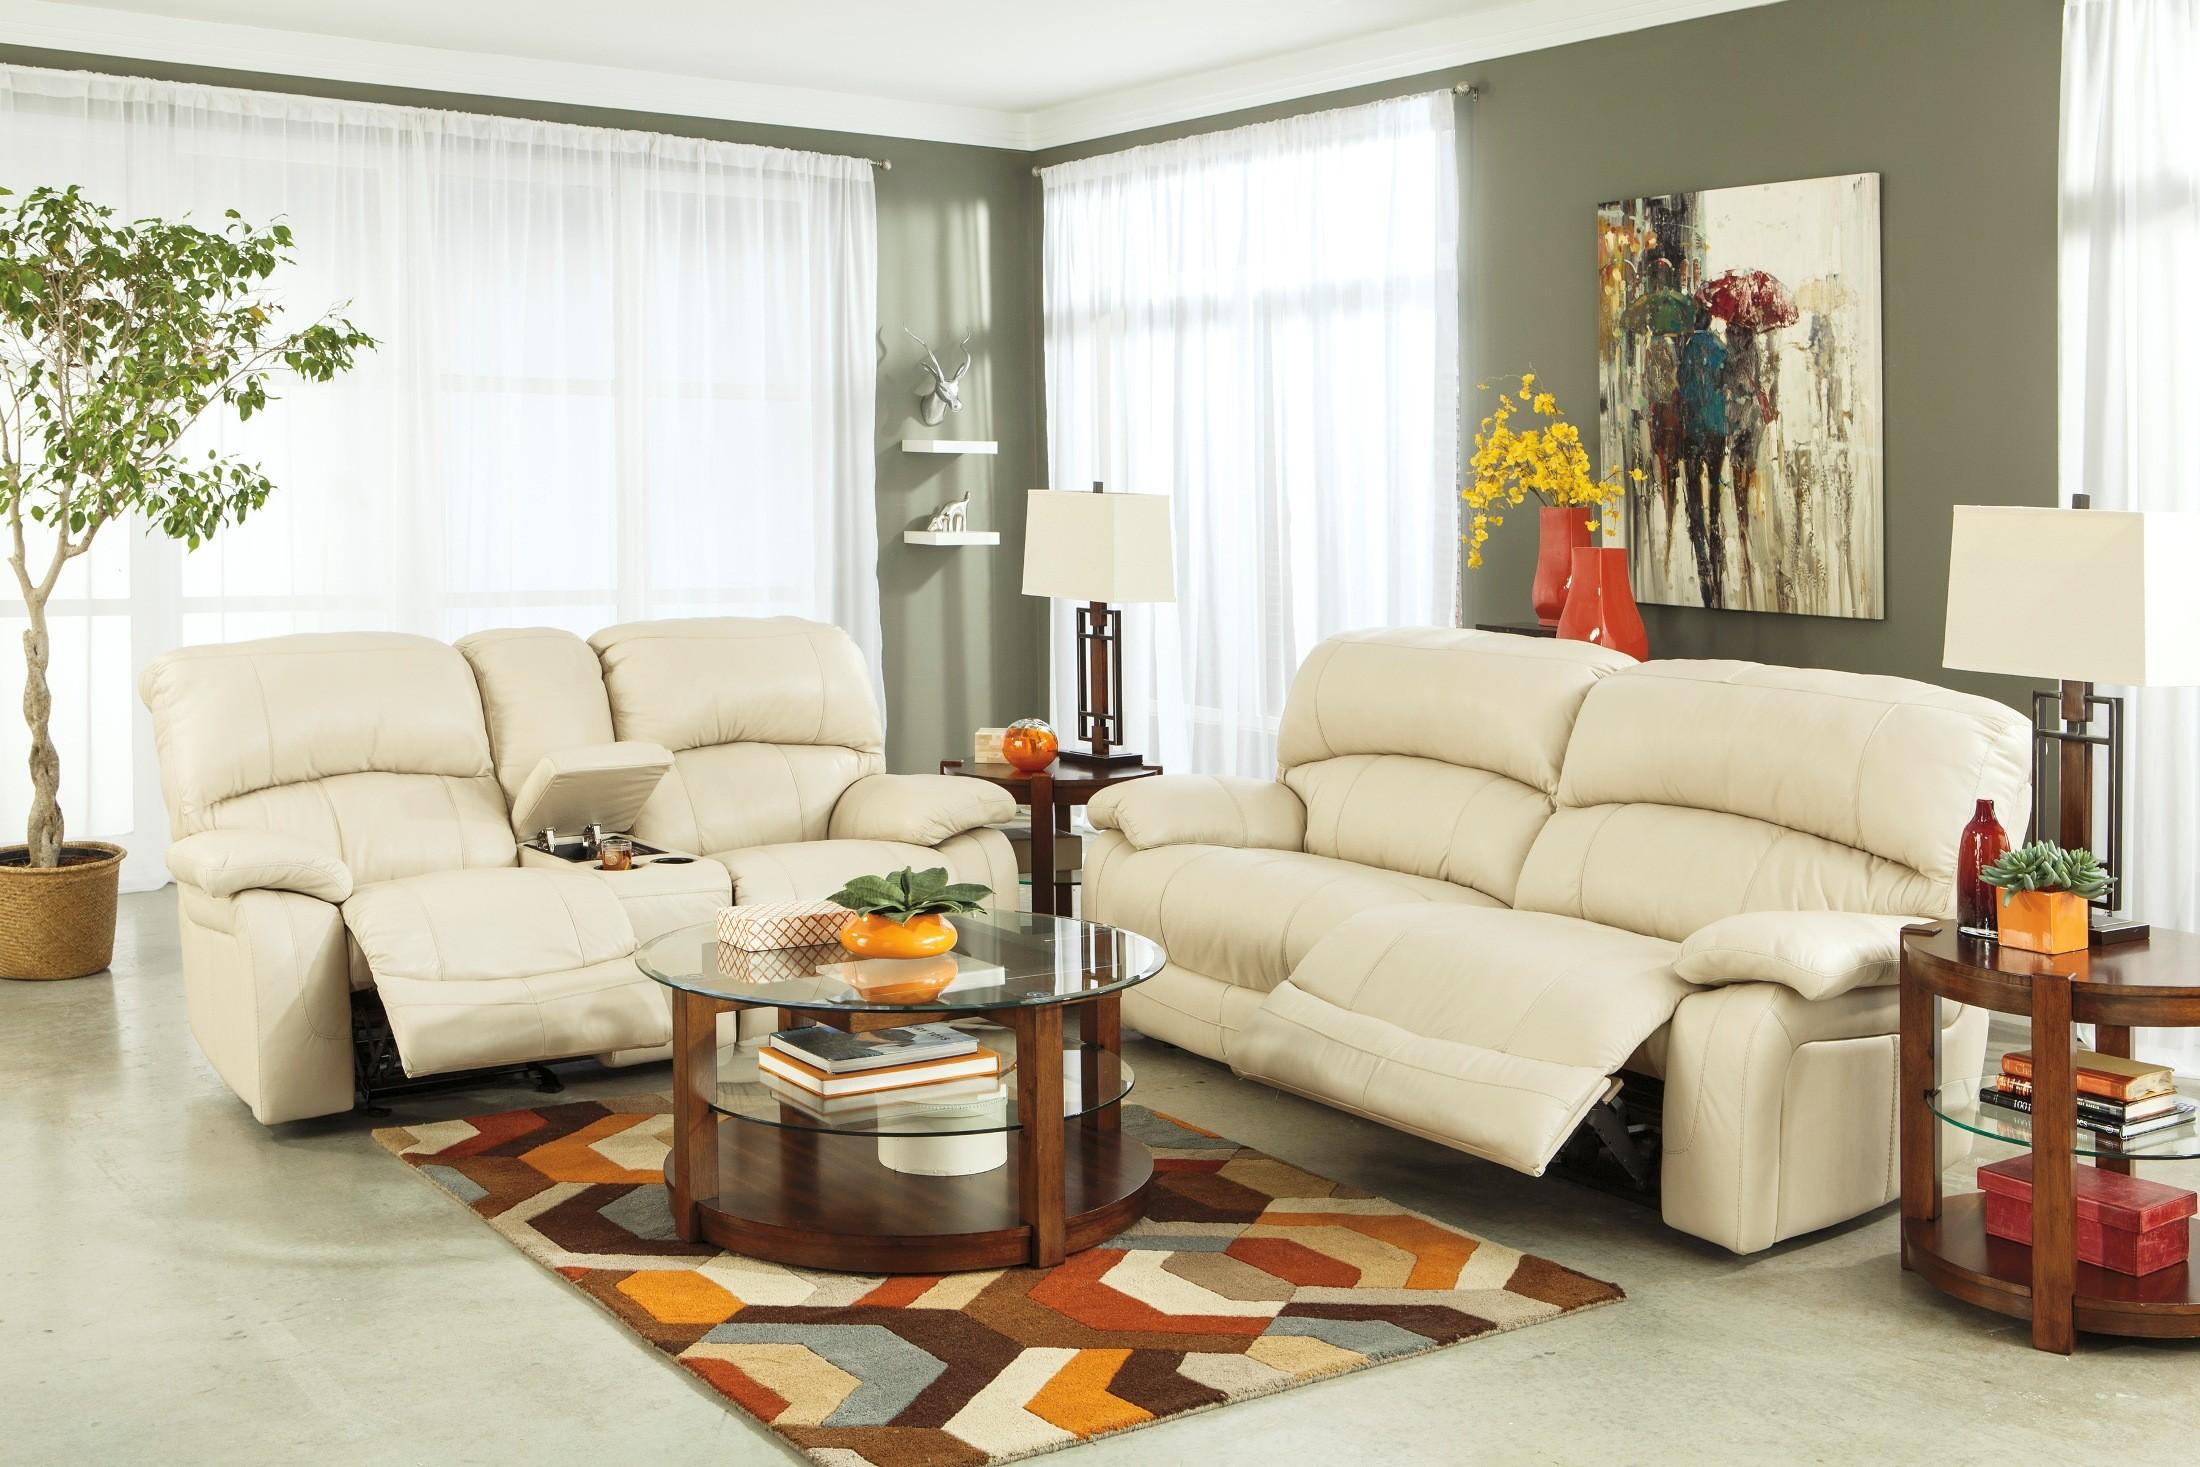 Damacio Cream 2 Seat Power Reclining Sofa From Ashley